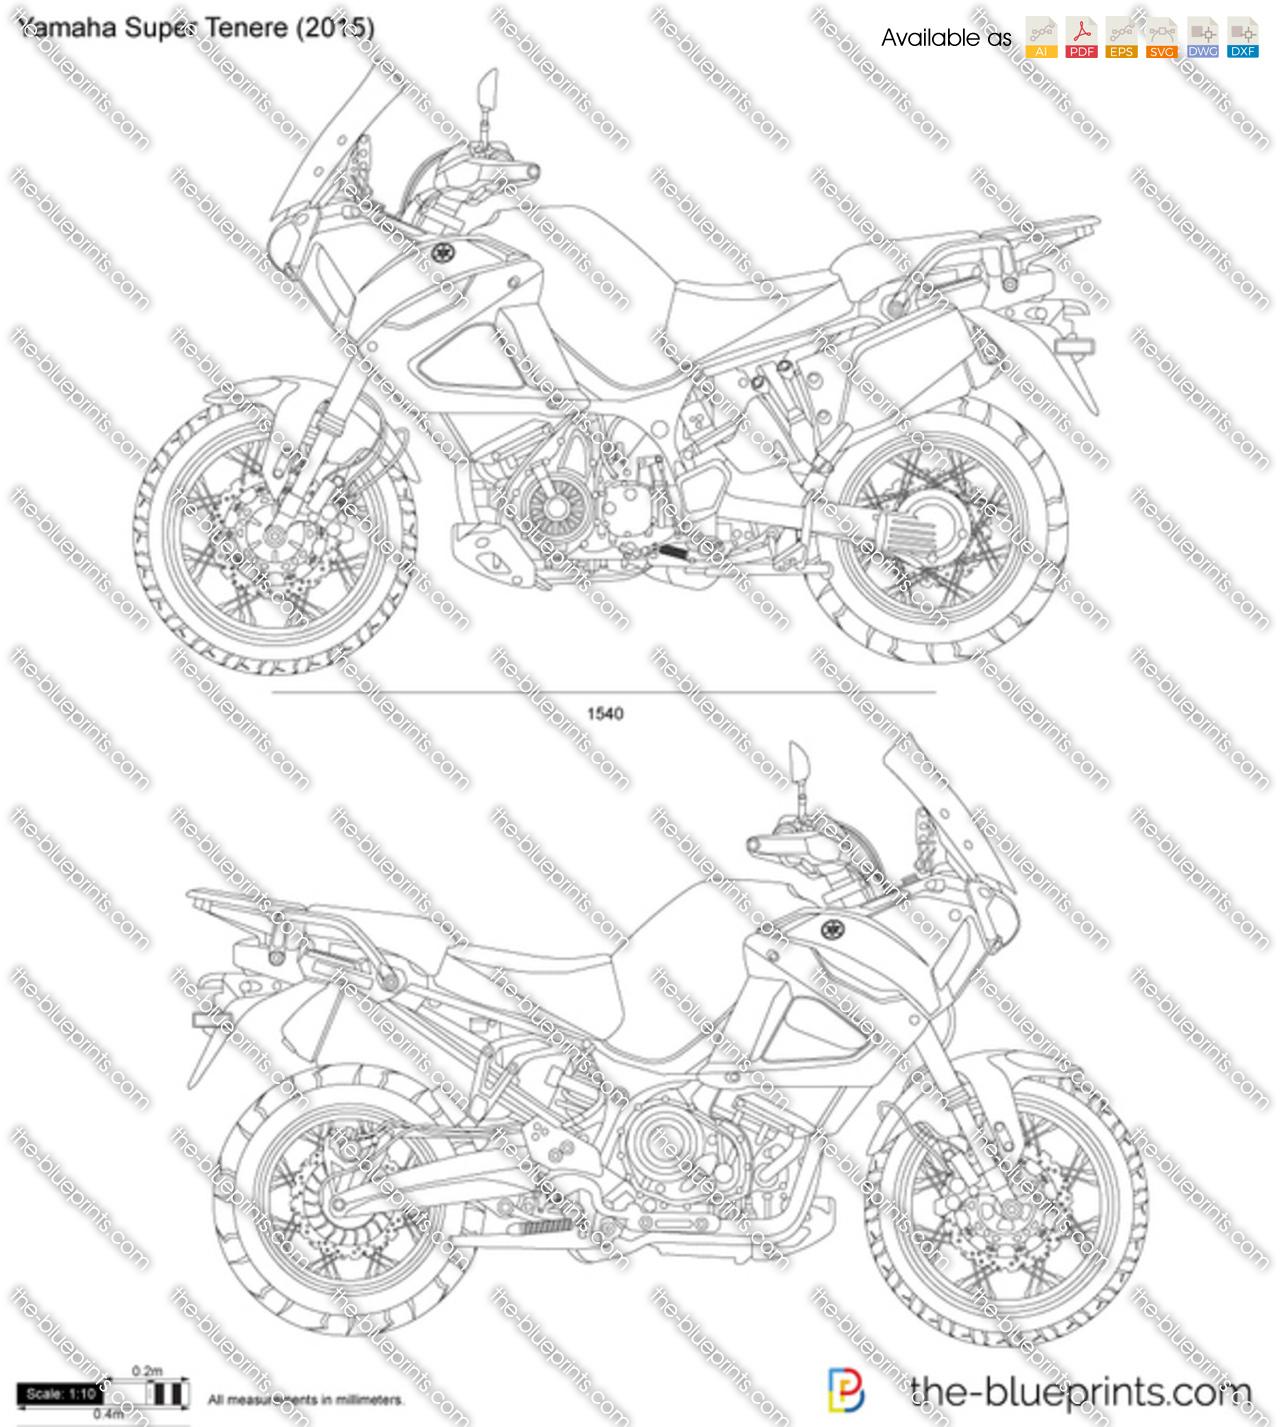 Yamaha Super Tenere 2018